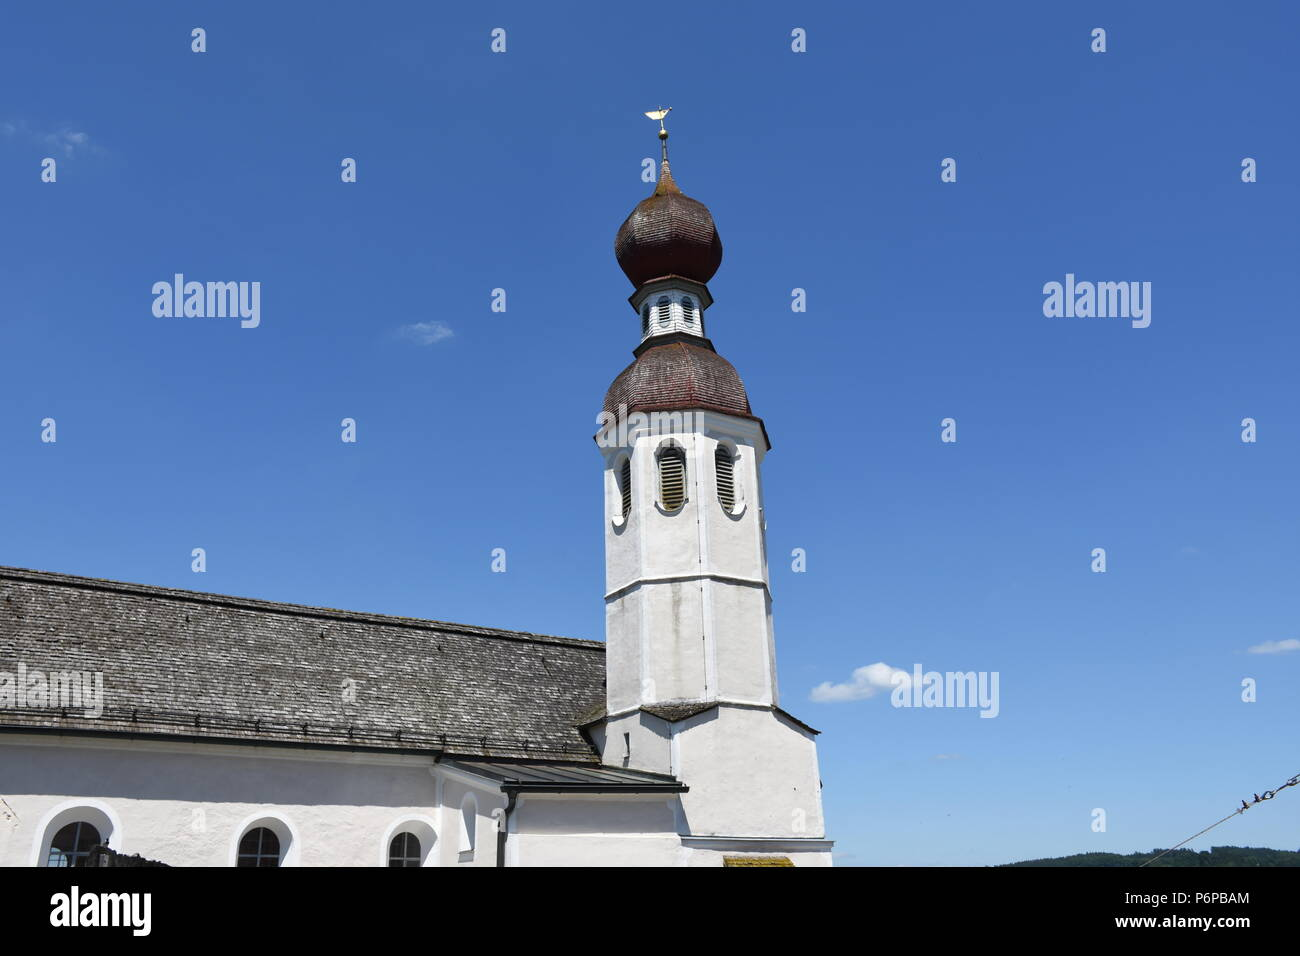 Filialkirche St. Andreas in Thalkirchen Oberbayern - Stock Image